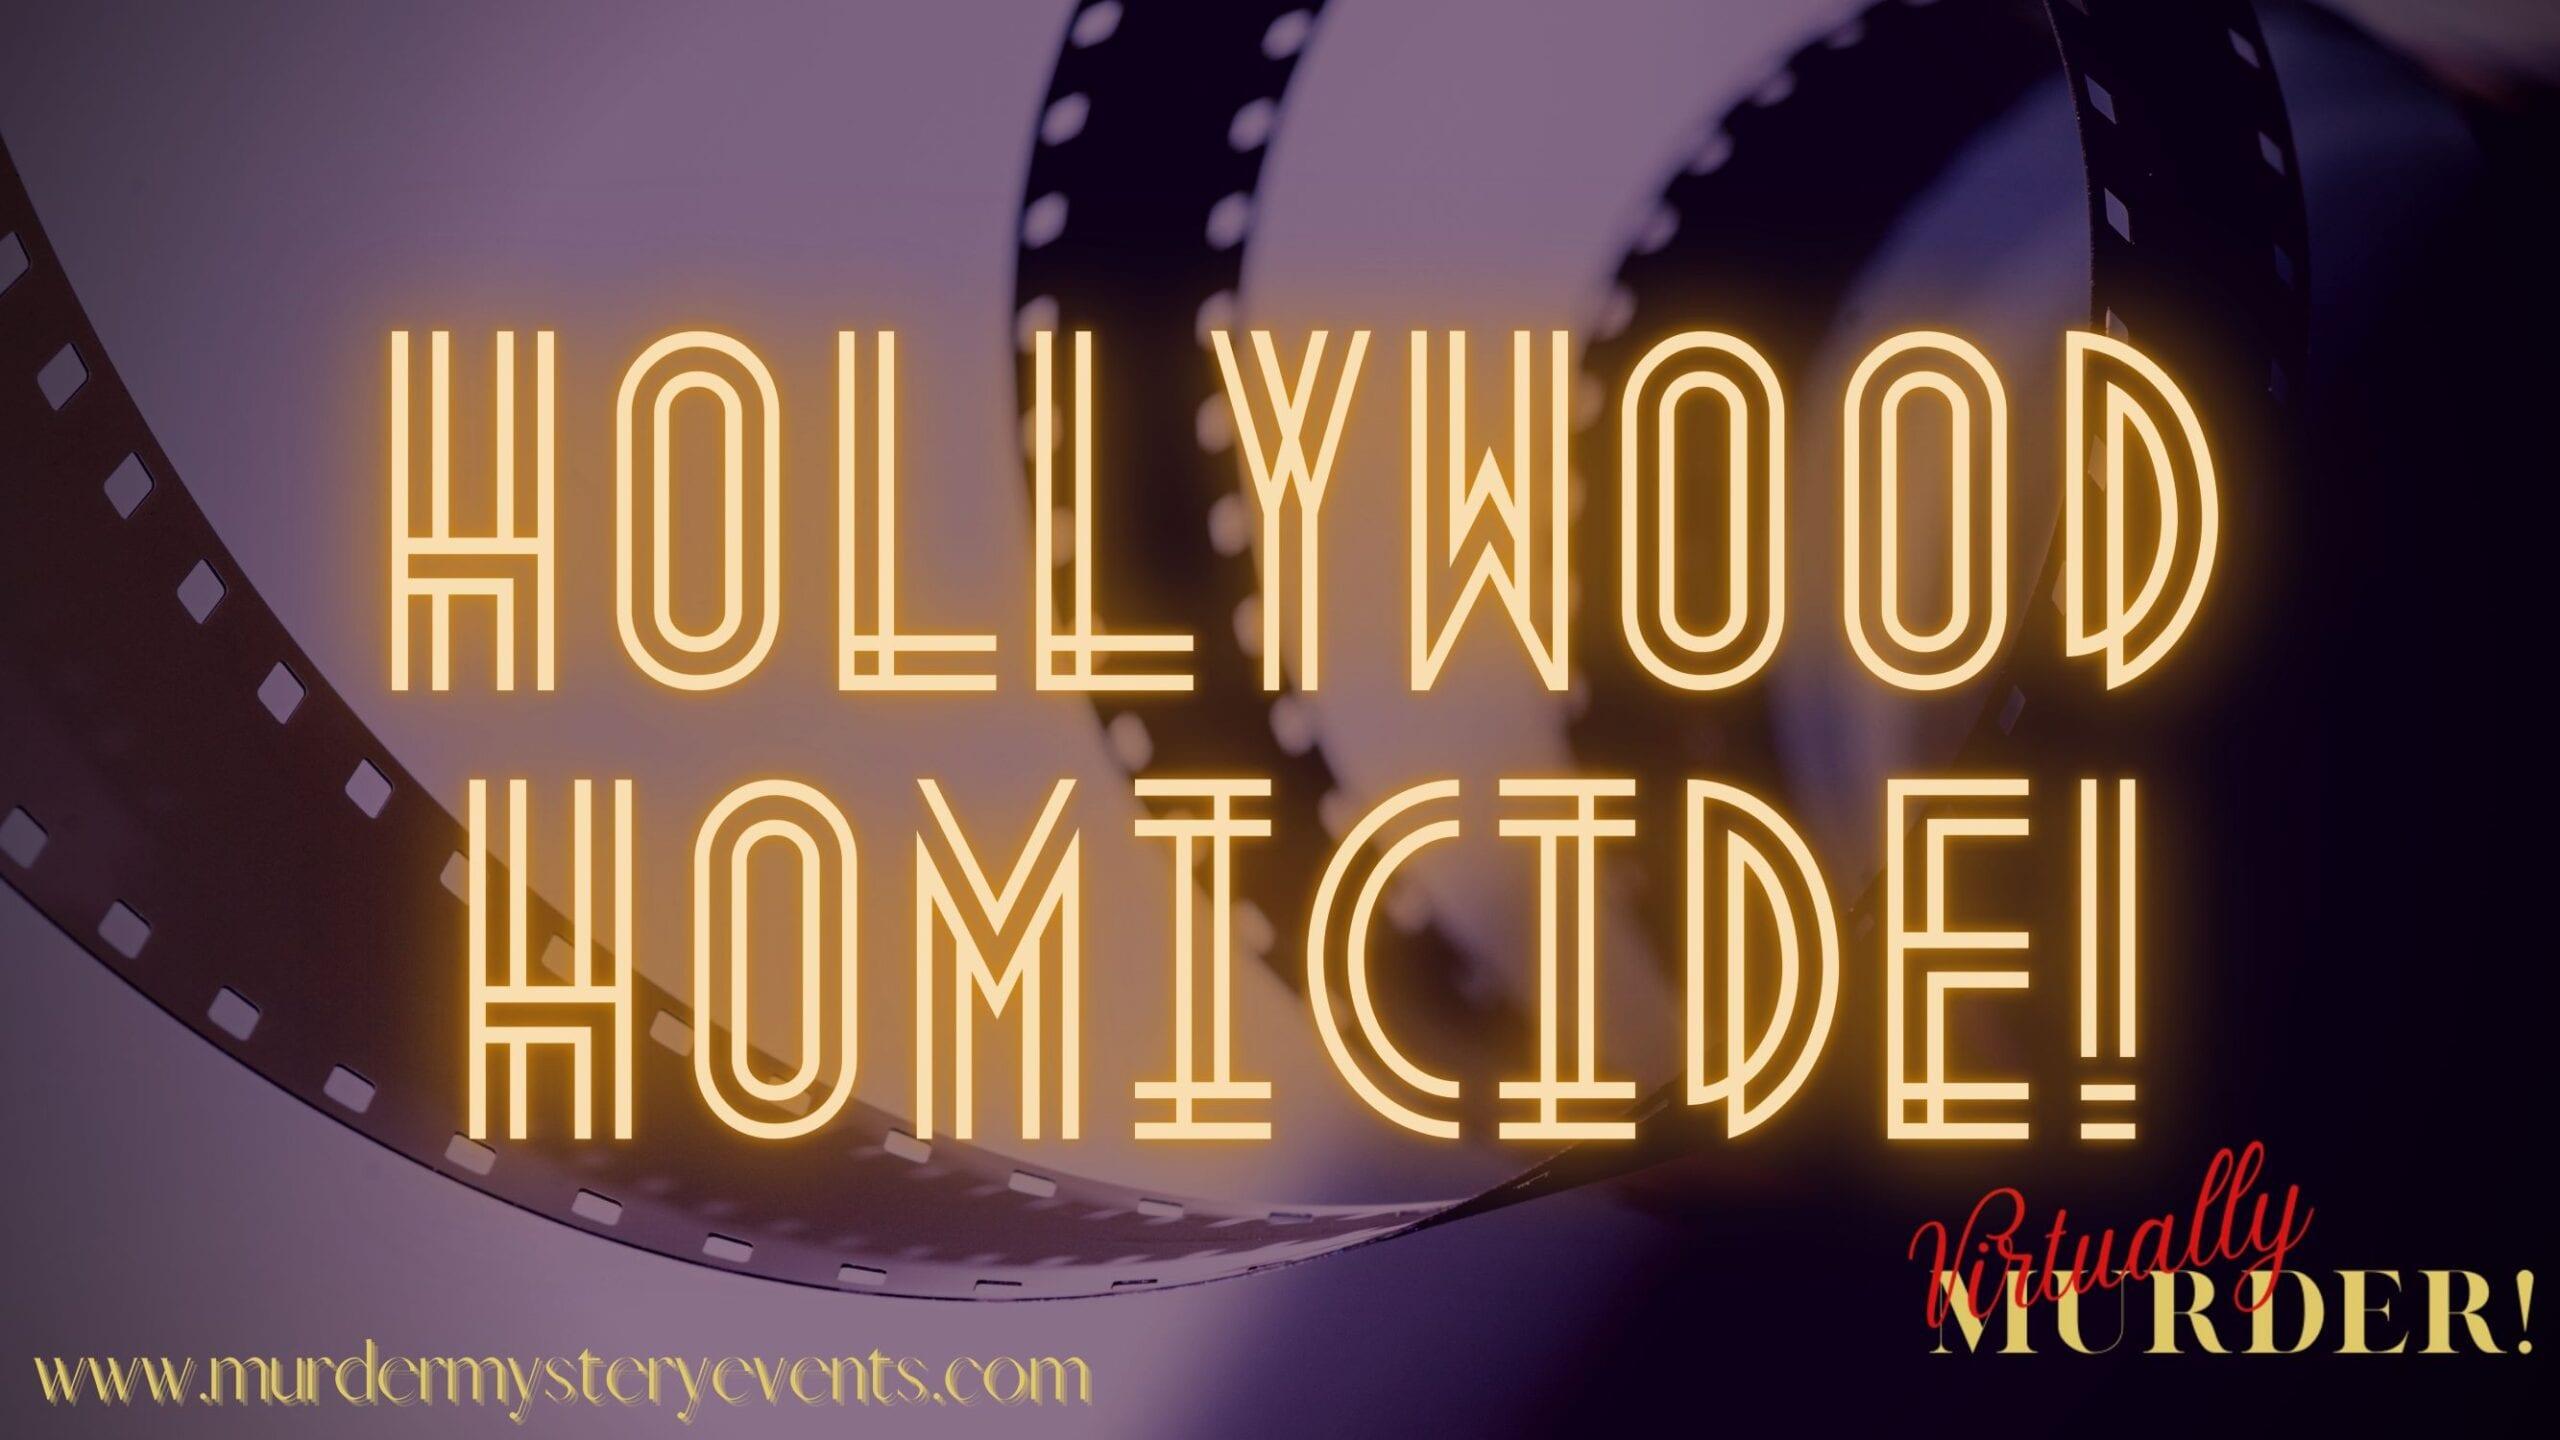 Hollywood Homicide Online Murder Mystery